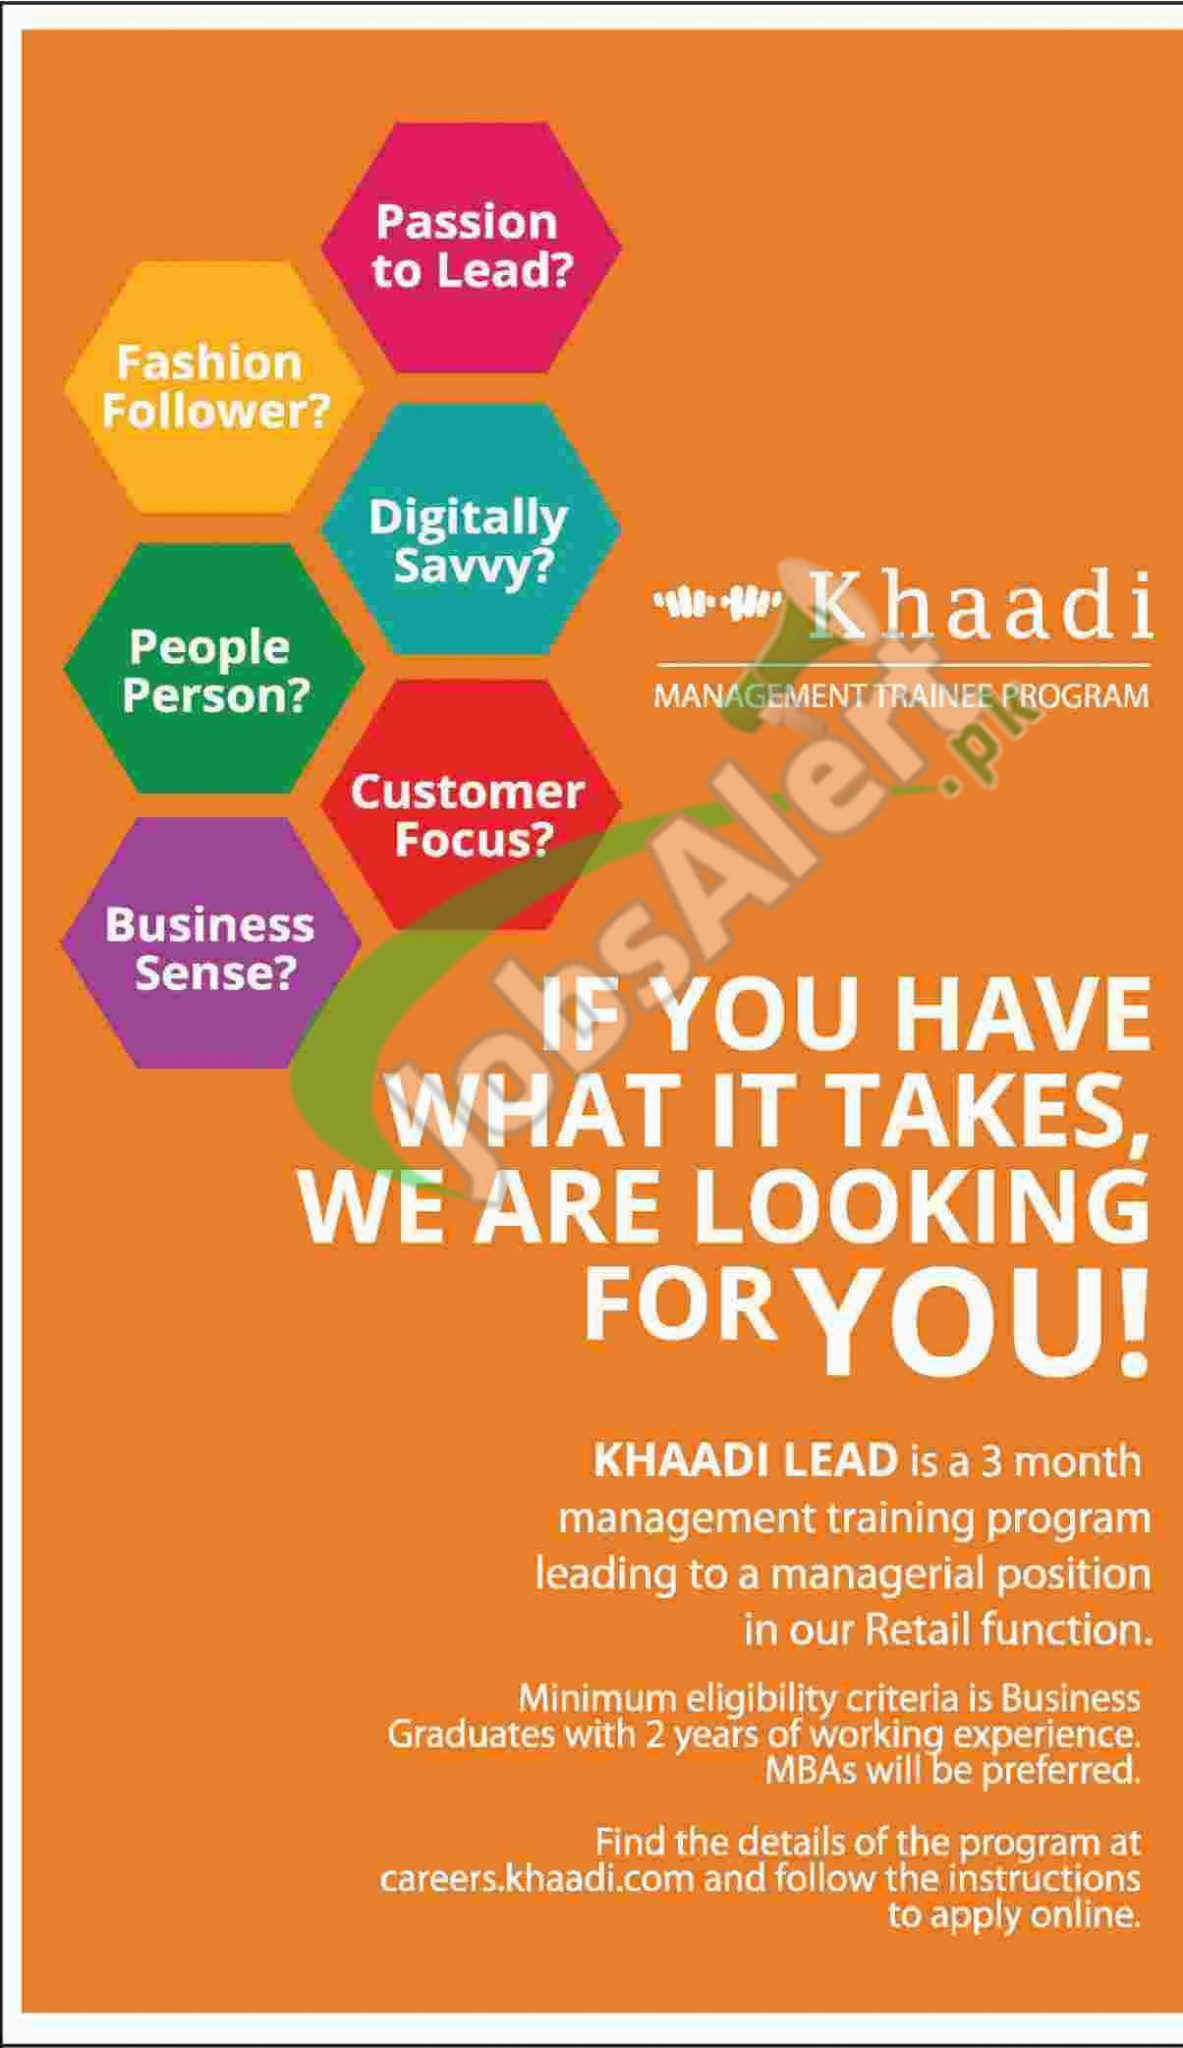 Khaadi Management Trainee Program